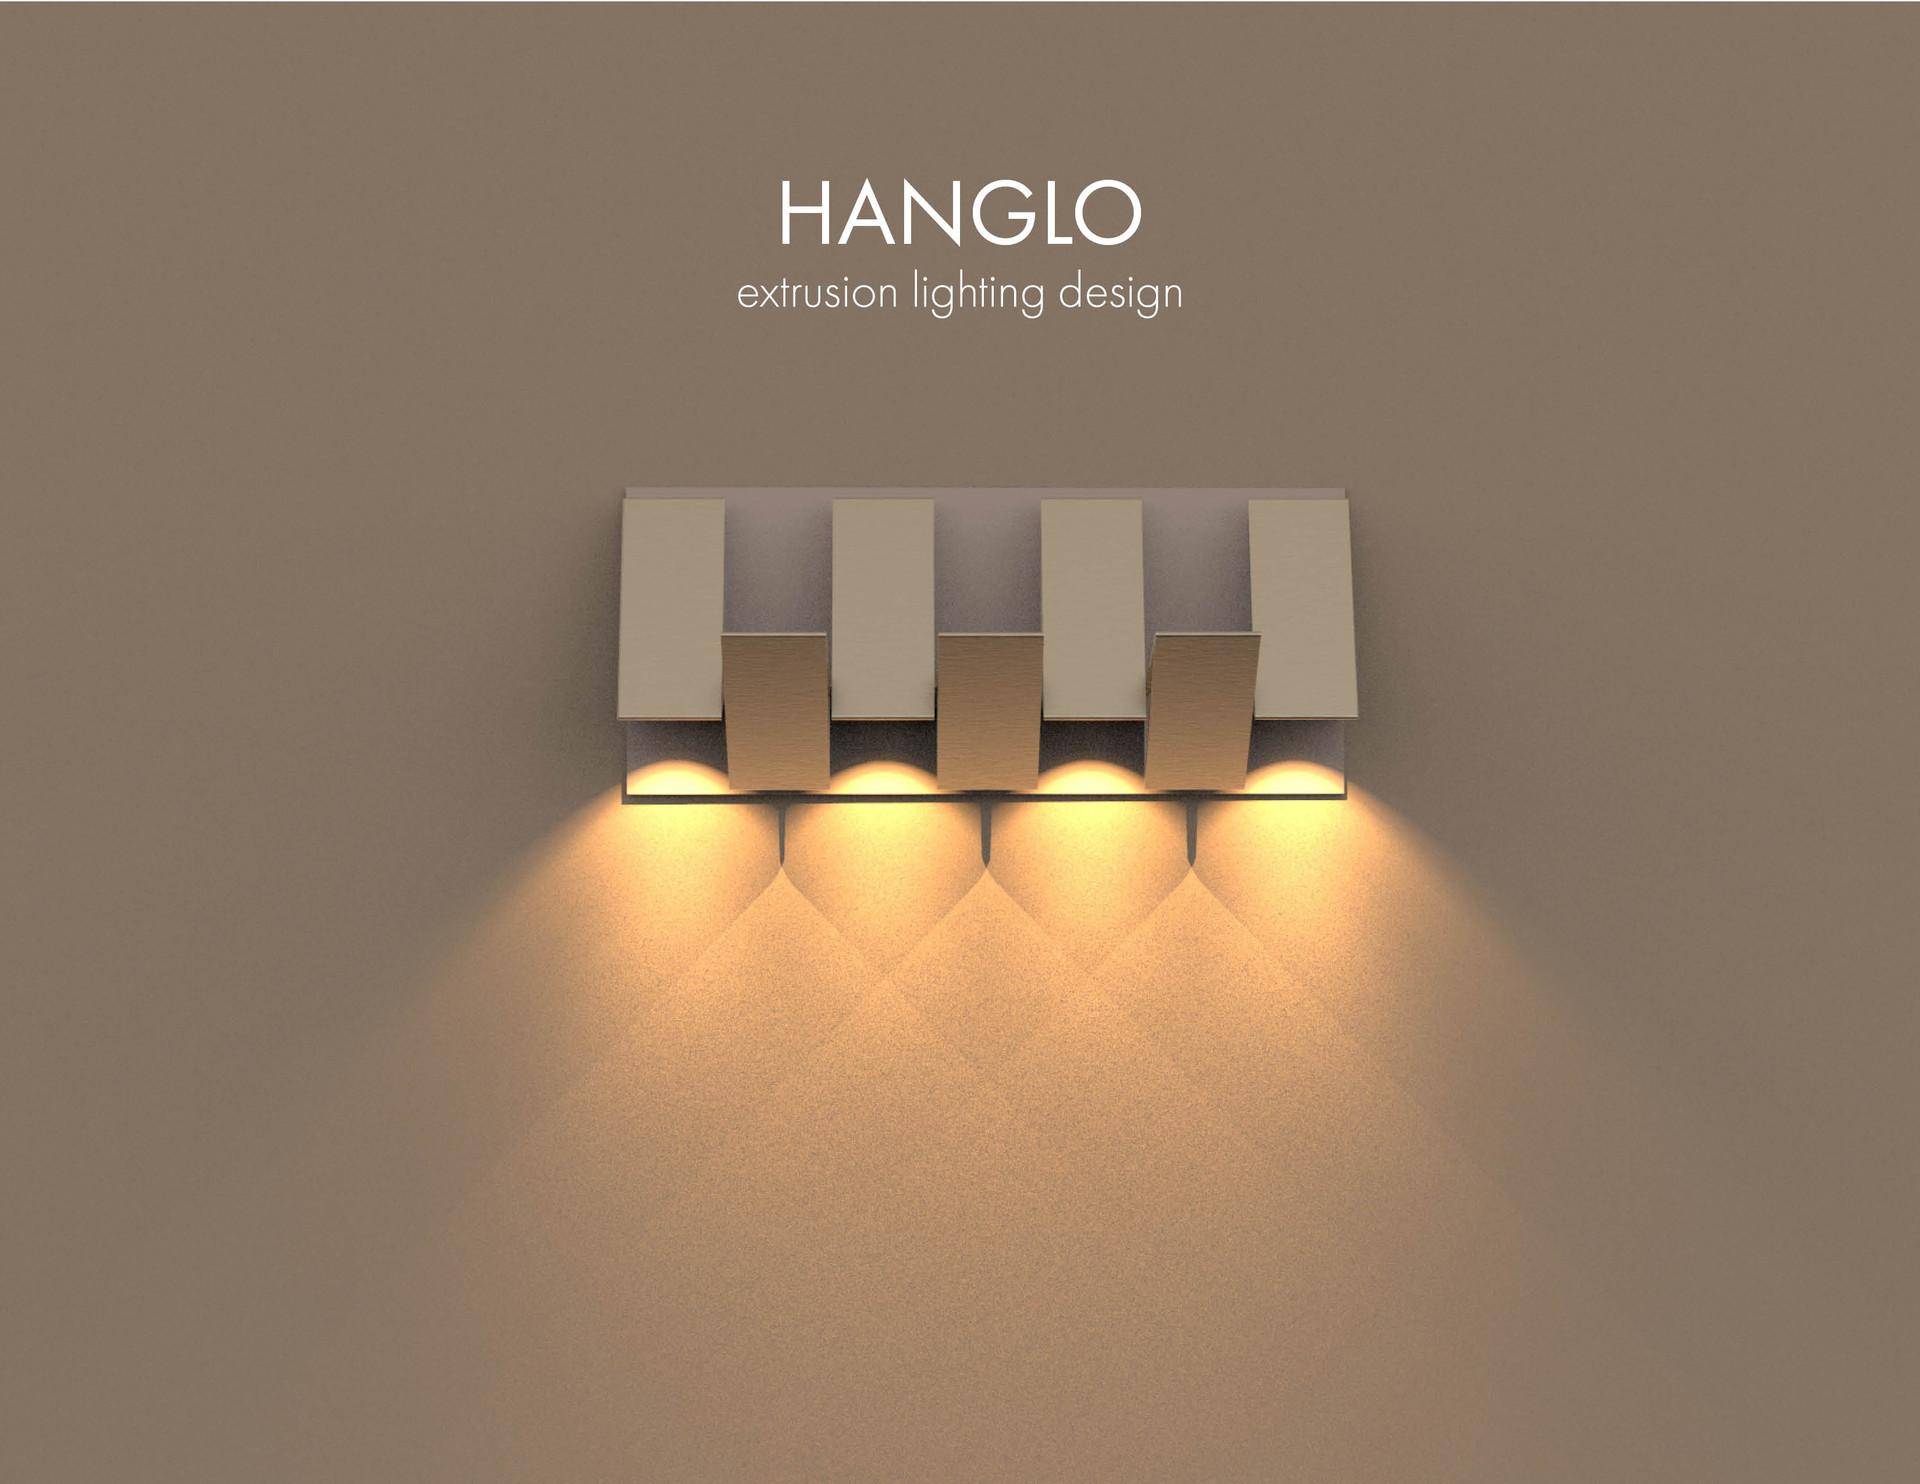 Hanglo